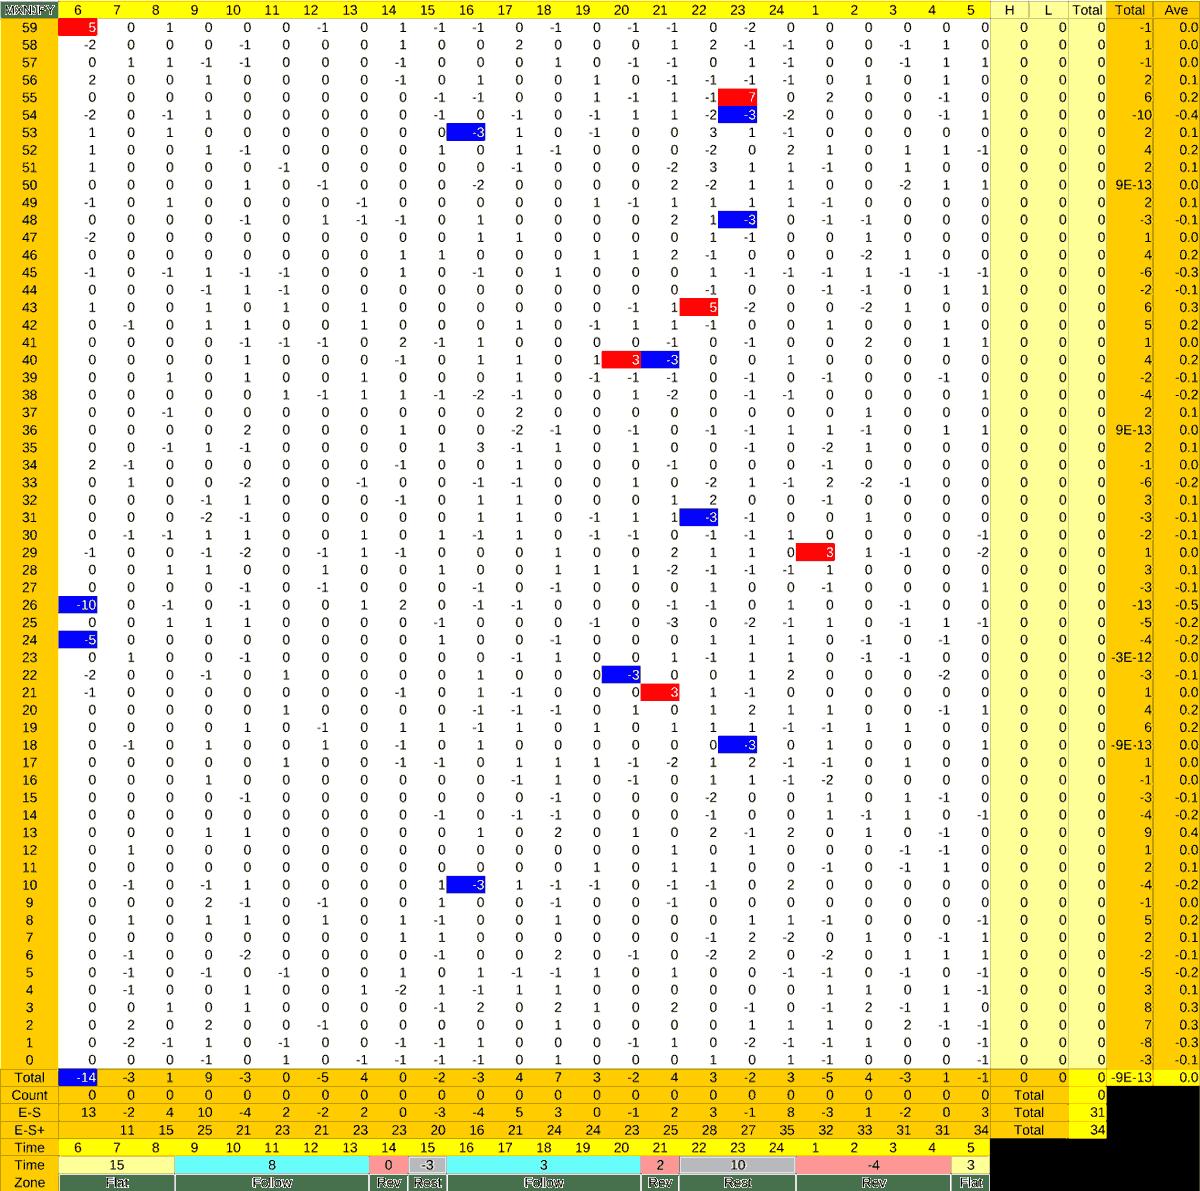 20210602_HS(3)MXNJPY